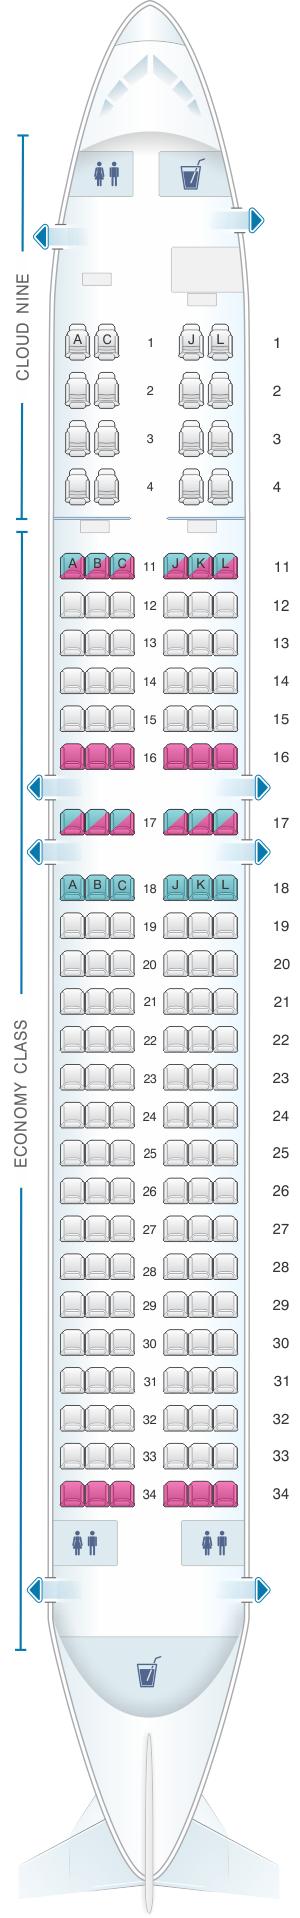 Seat map for Ethiopian Boeing B737 800W